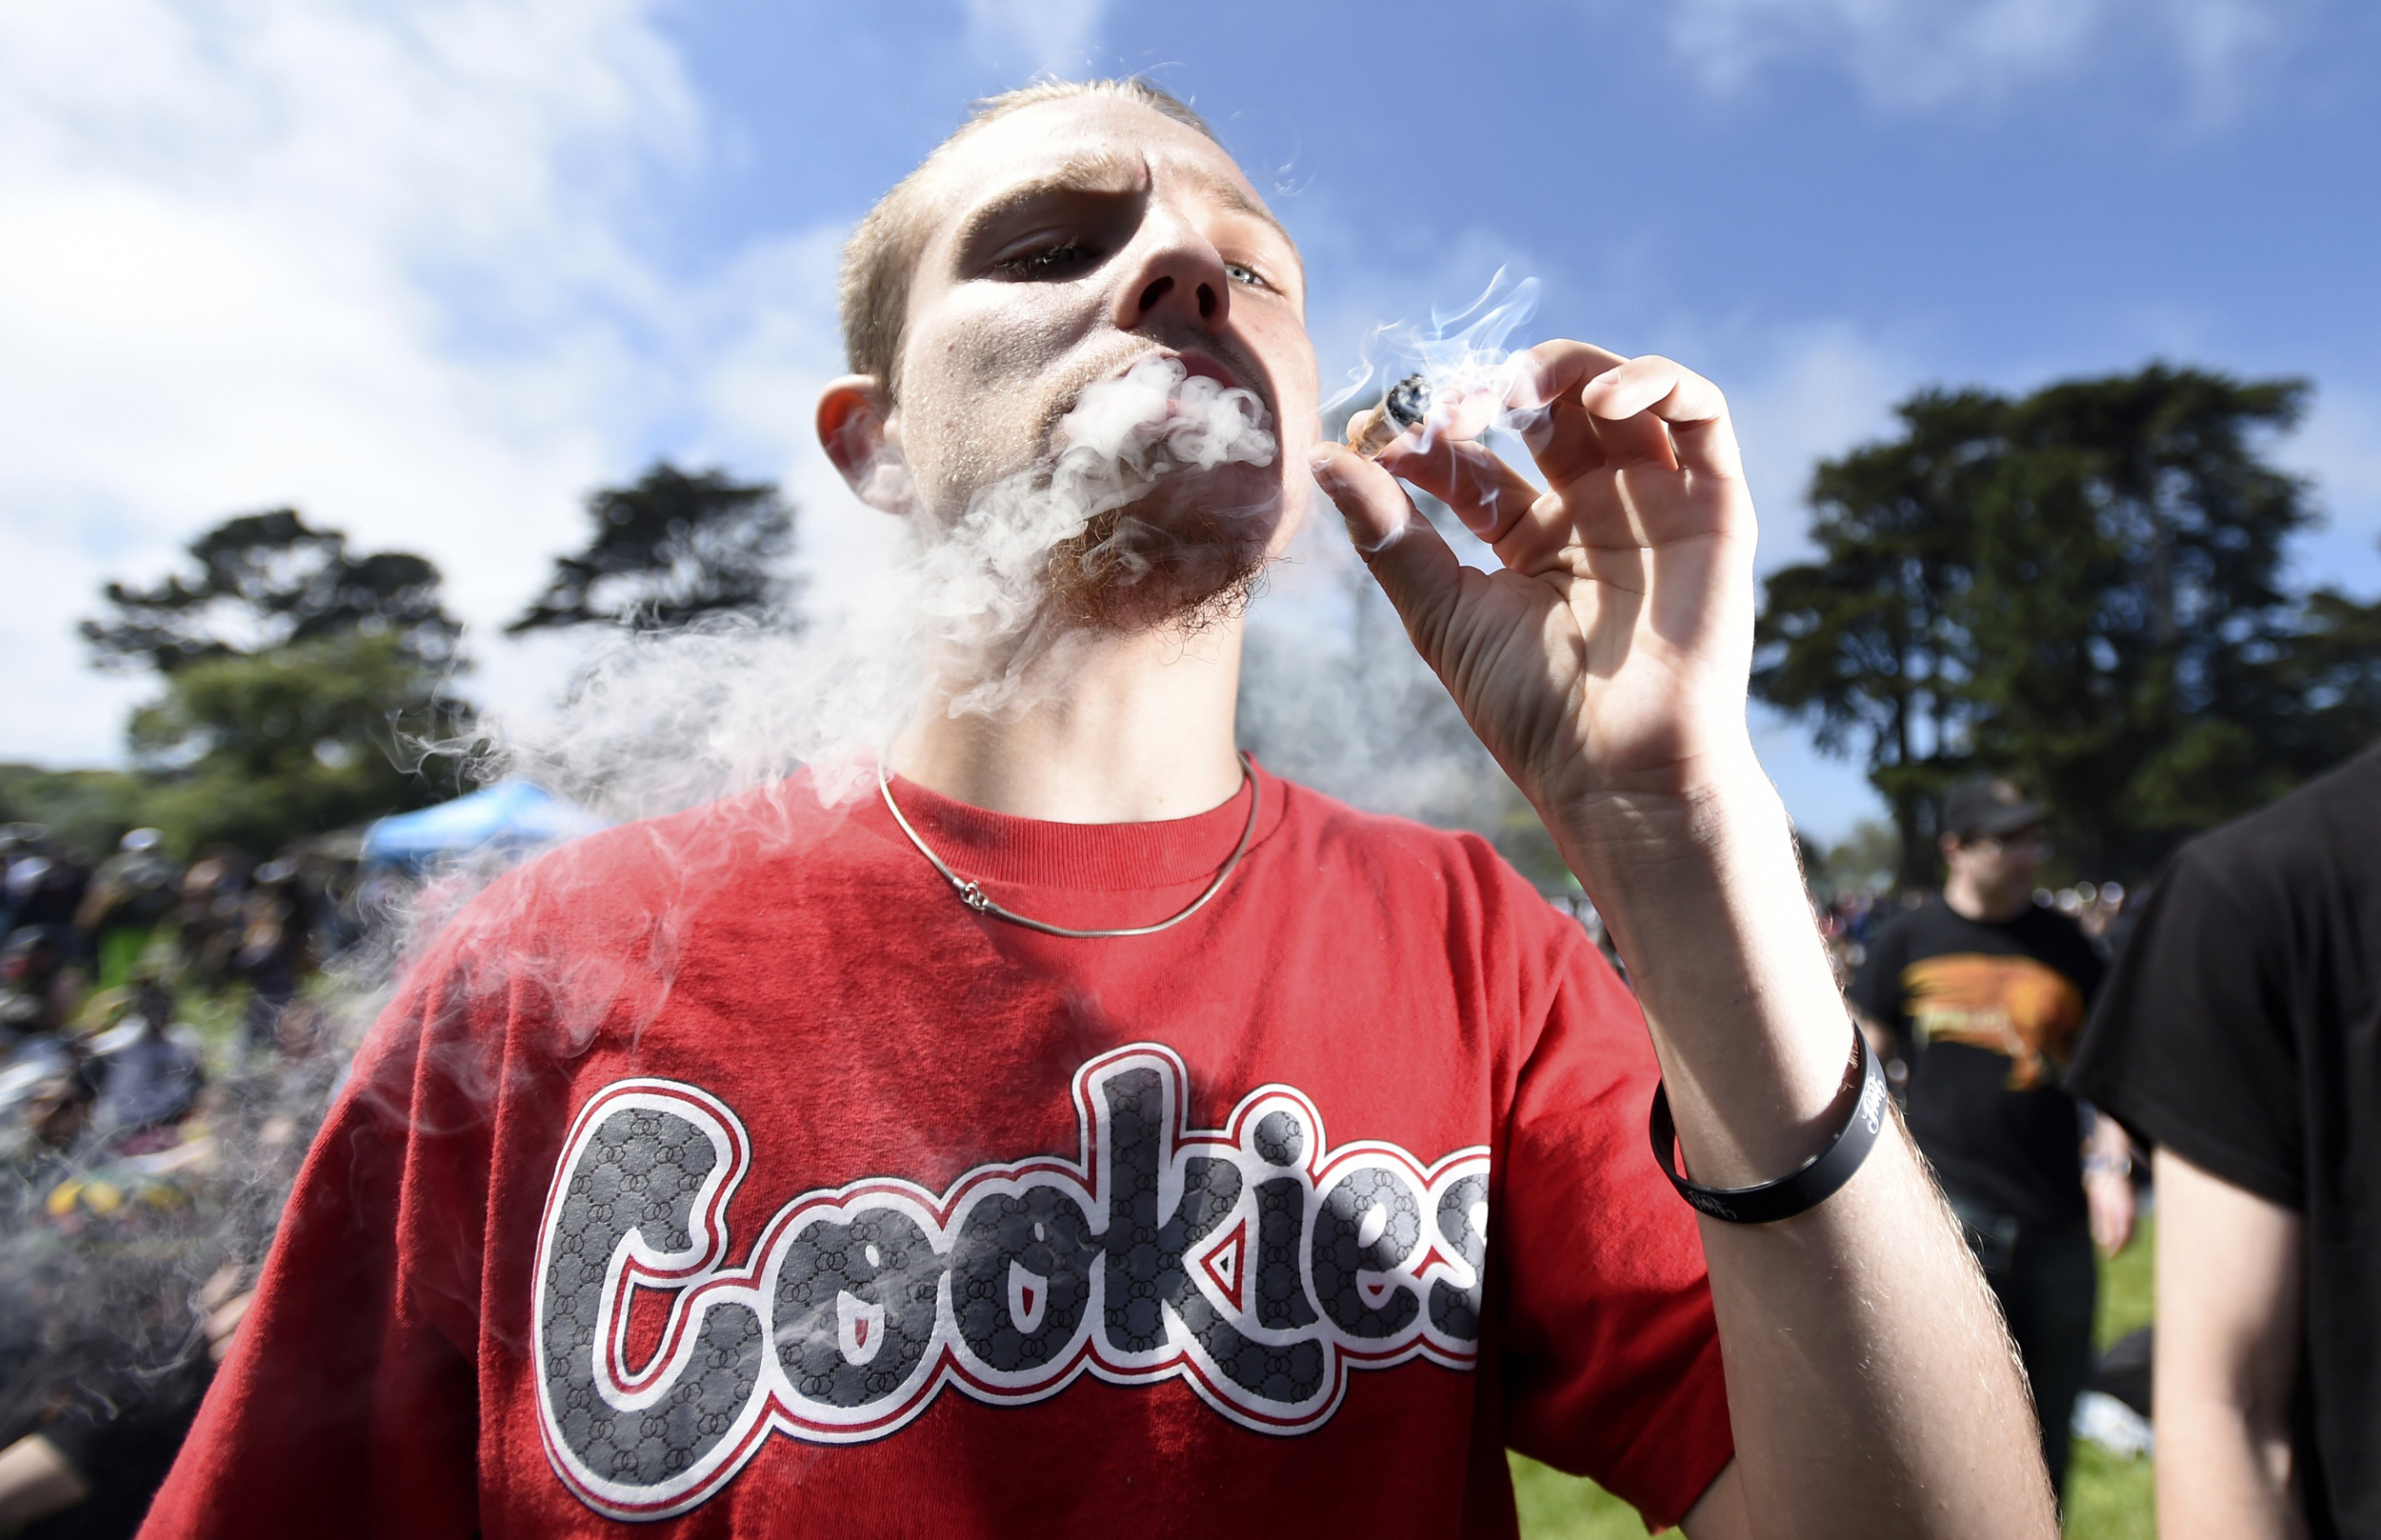 Weed the people? Companies relax drug-testing policies in bid to